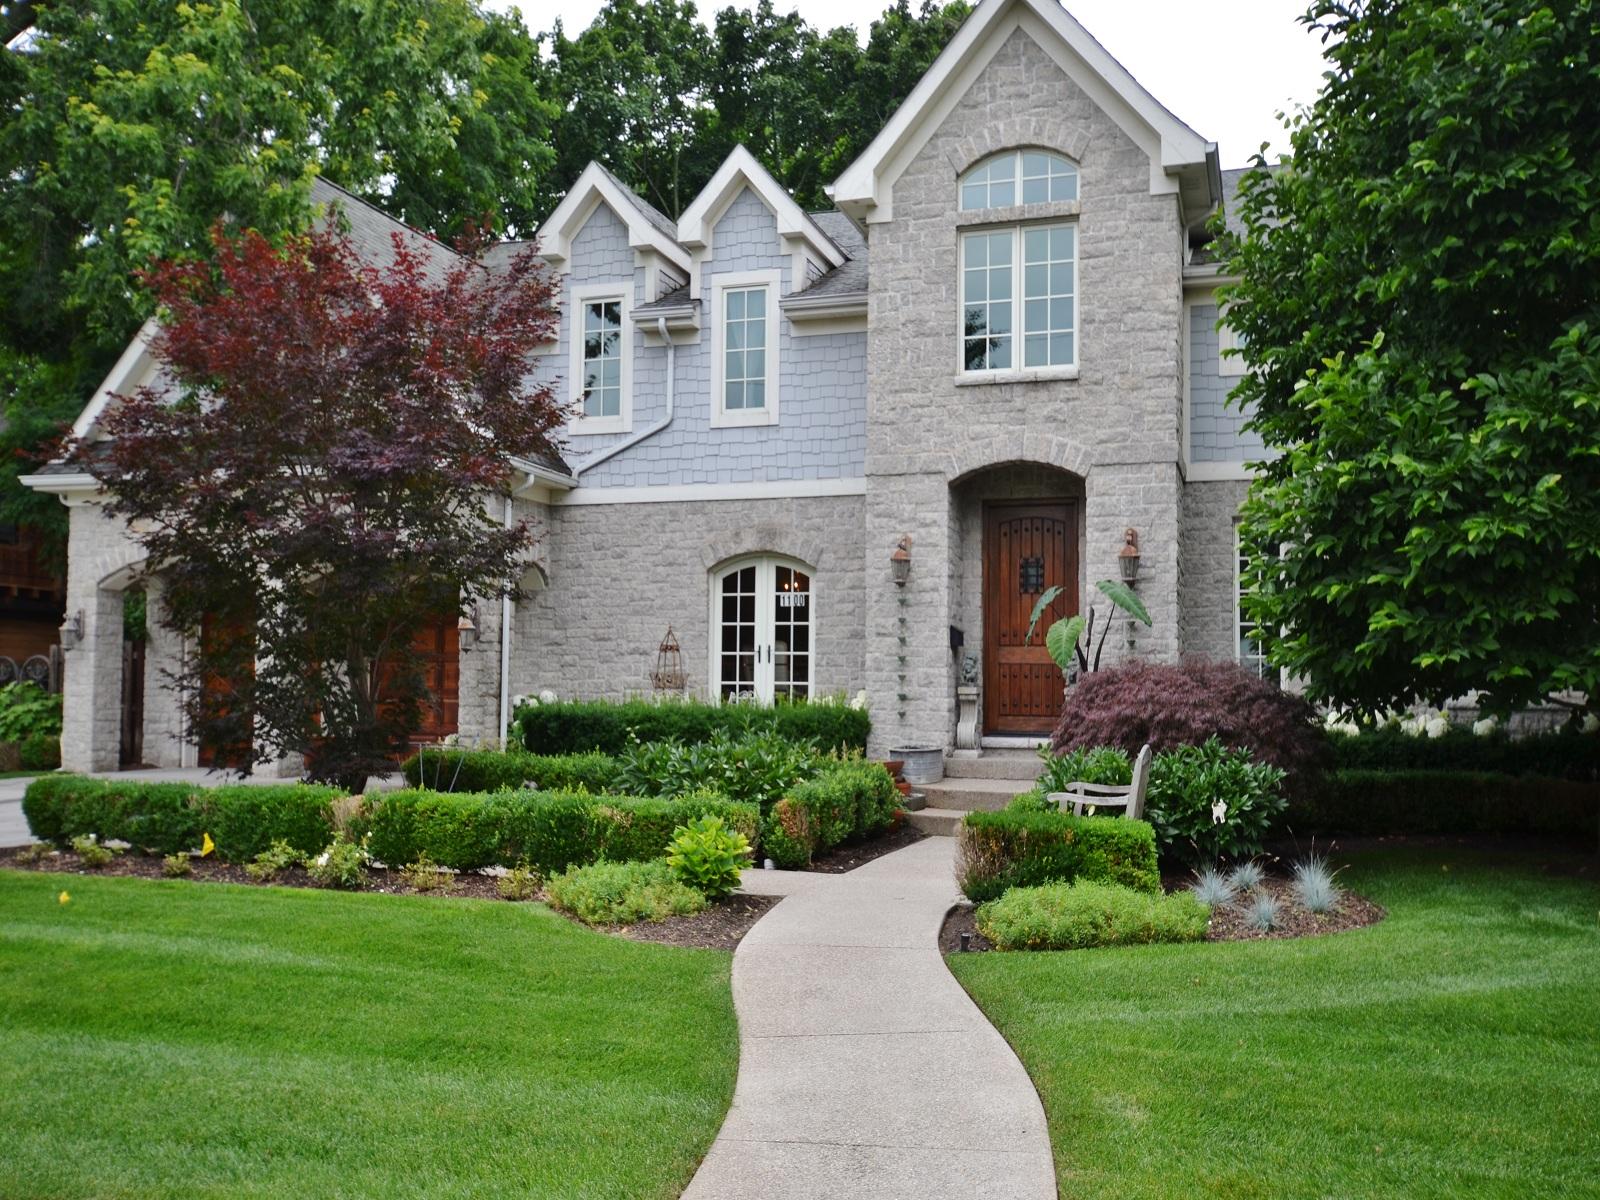 Single Family Home for Sale at Birmingham 1100 Birmingham Boulevard Birmingham, Michigan, 48009 United States